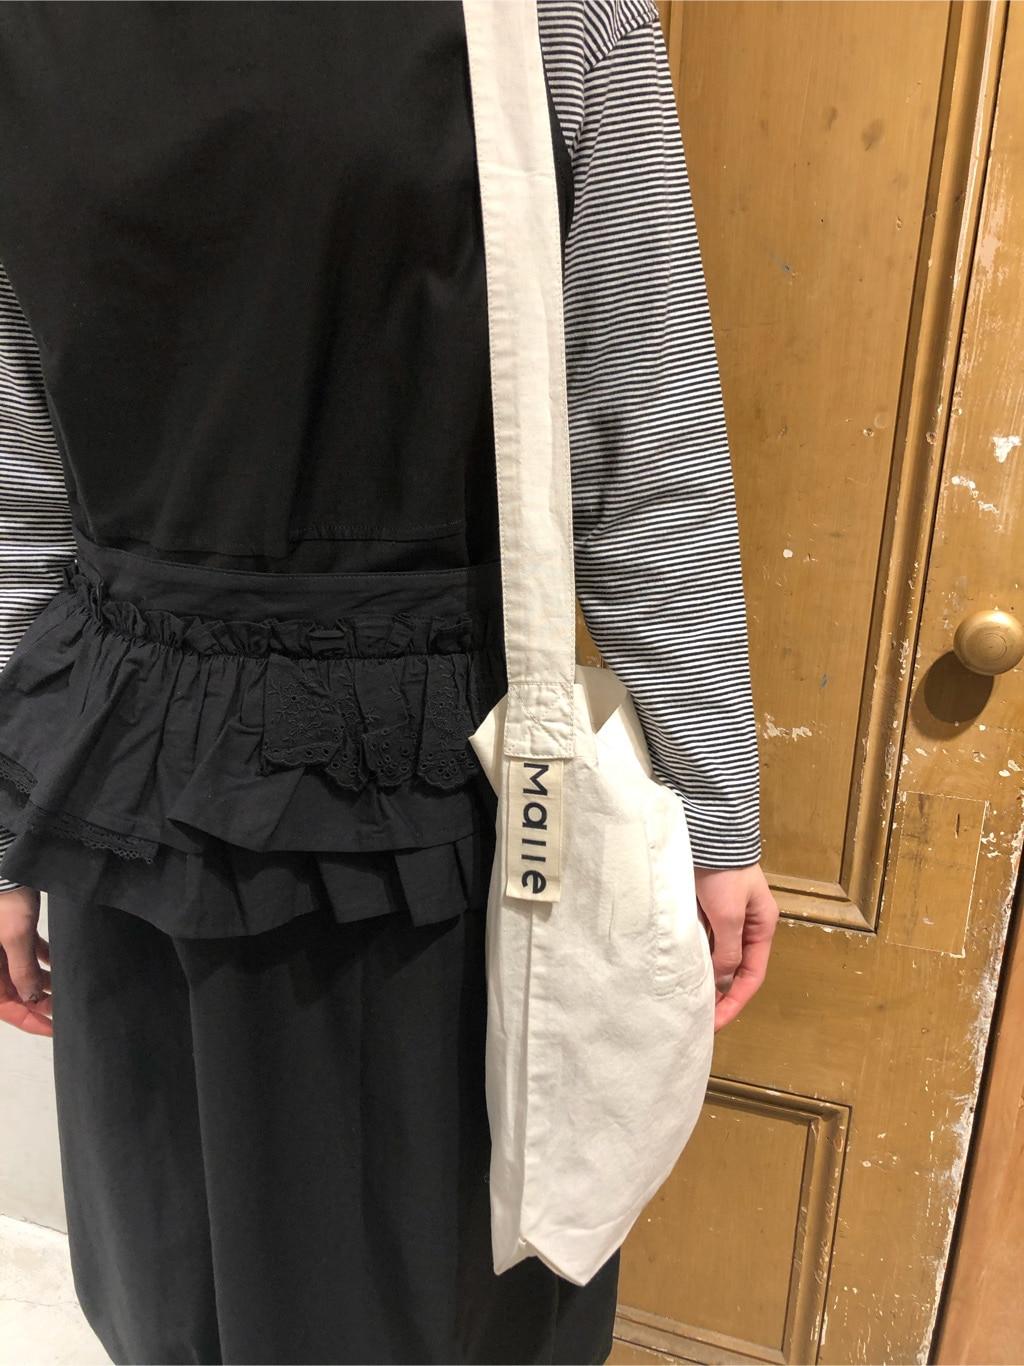 Malle chambre de charme ルミネ新宿 身長:164cm 2020.12.15